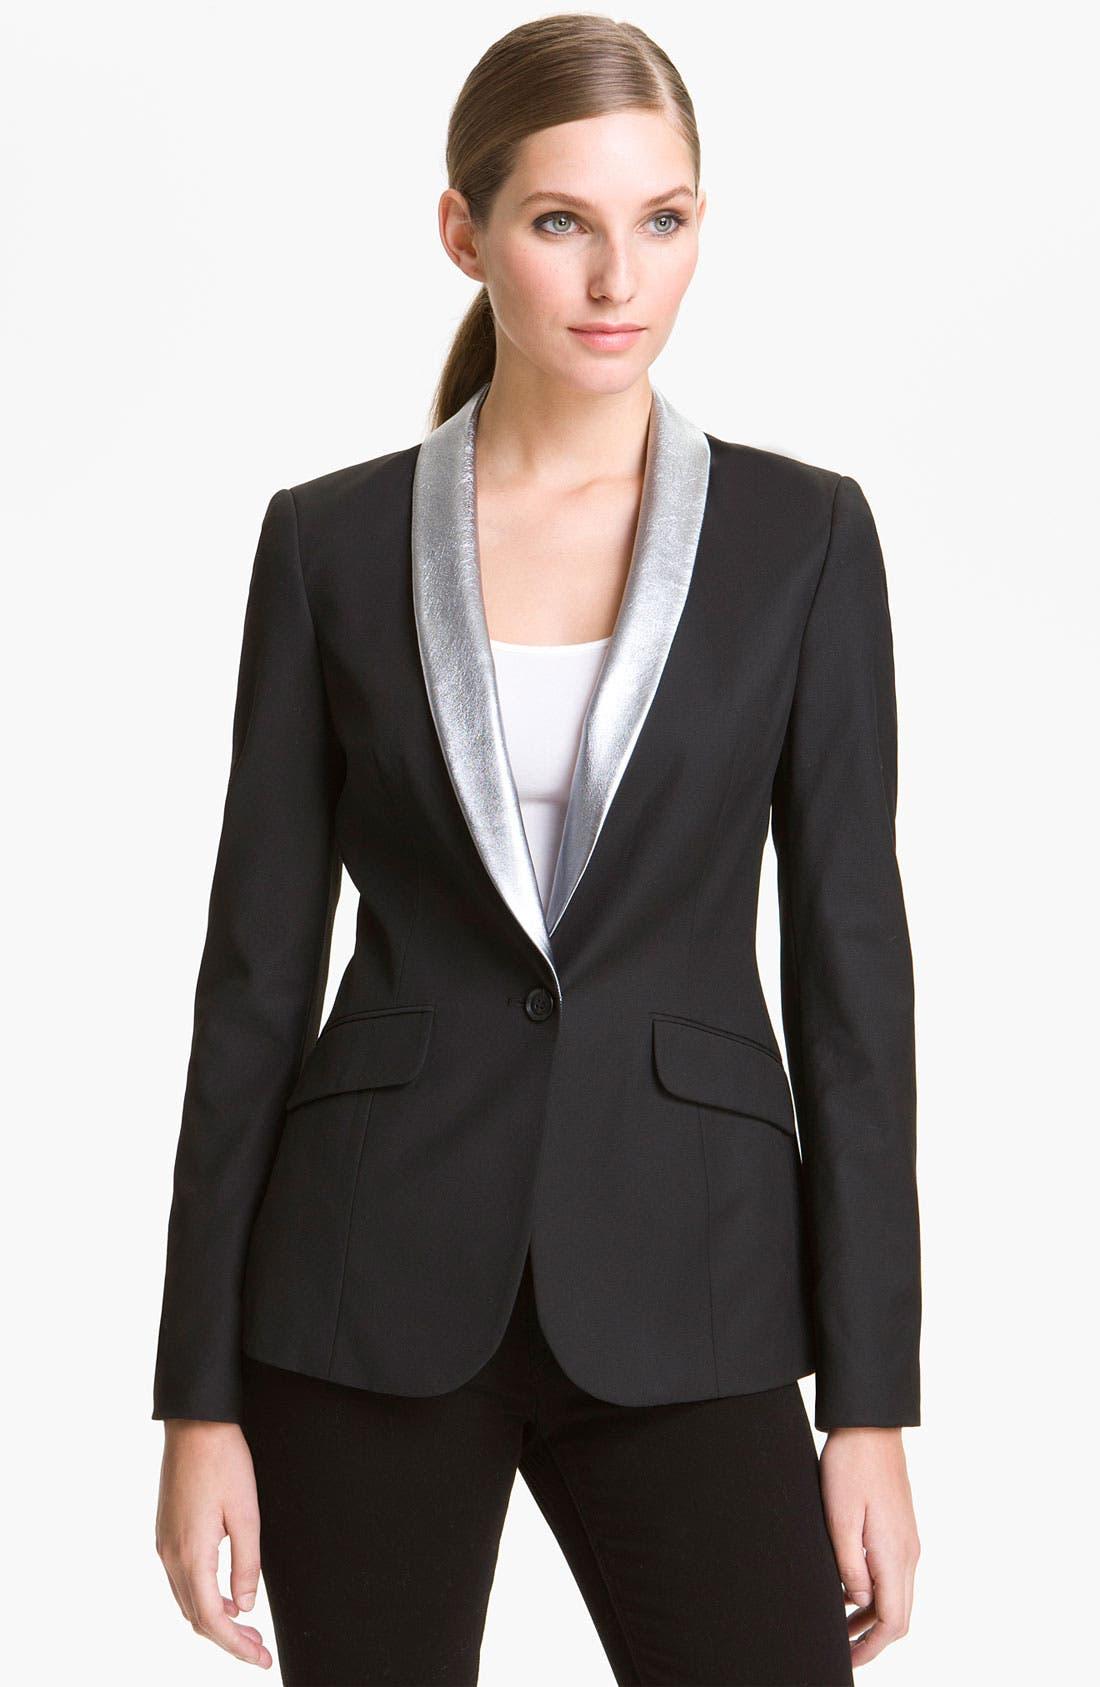 Alternate Image 1 Selected - Elizabeth and James 'Rex' Metallic Leather Collar Blazer